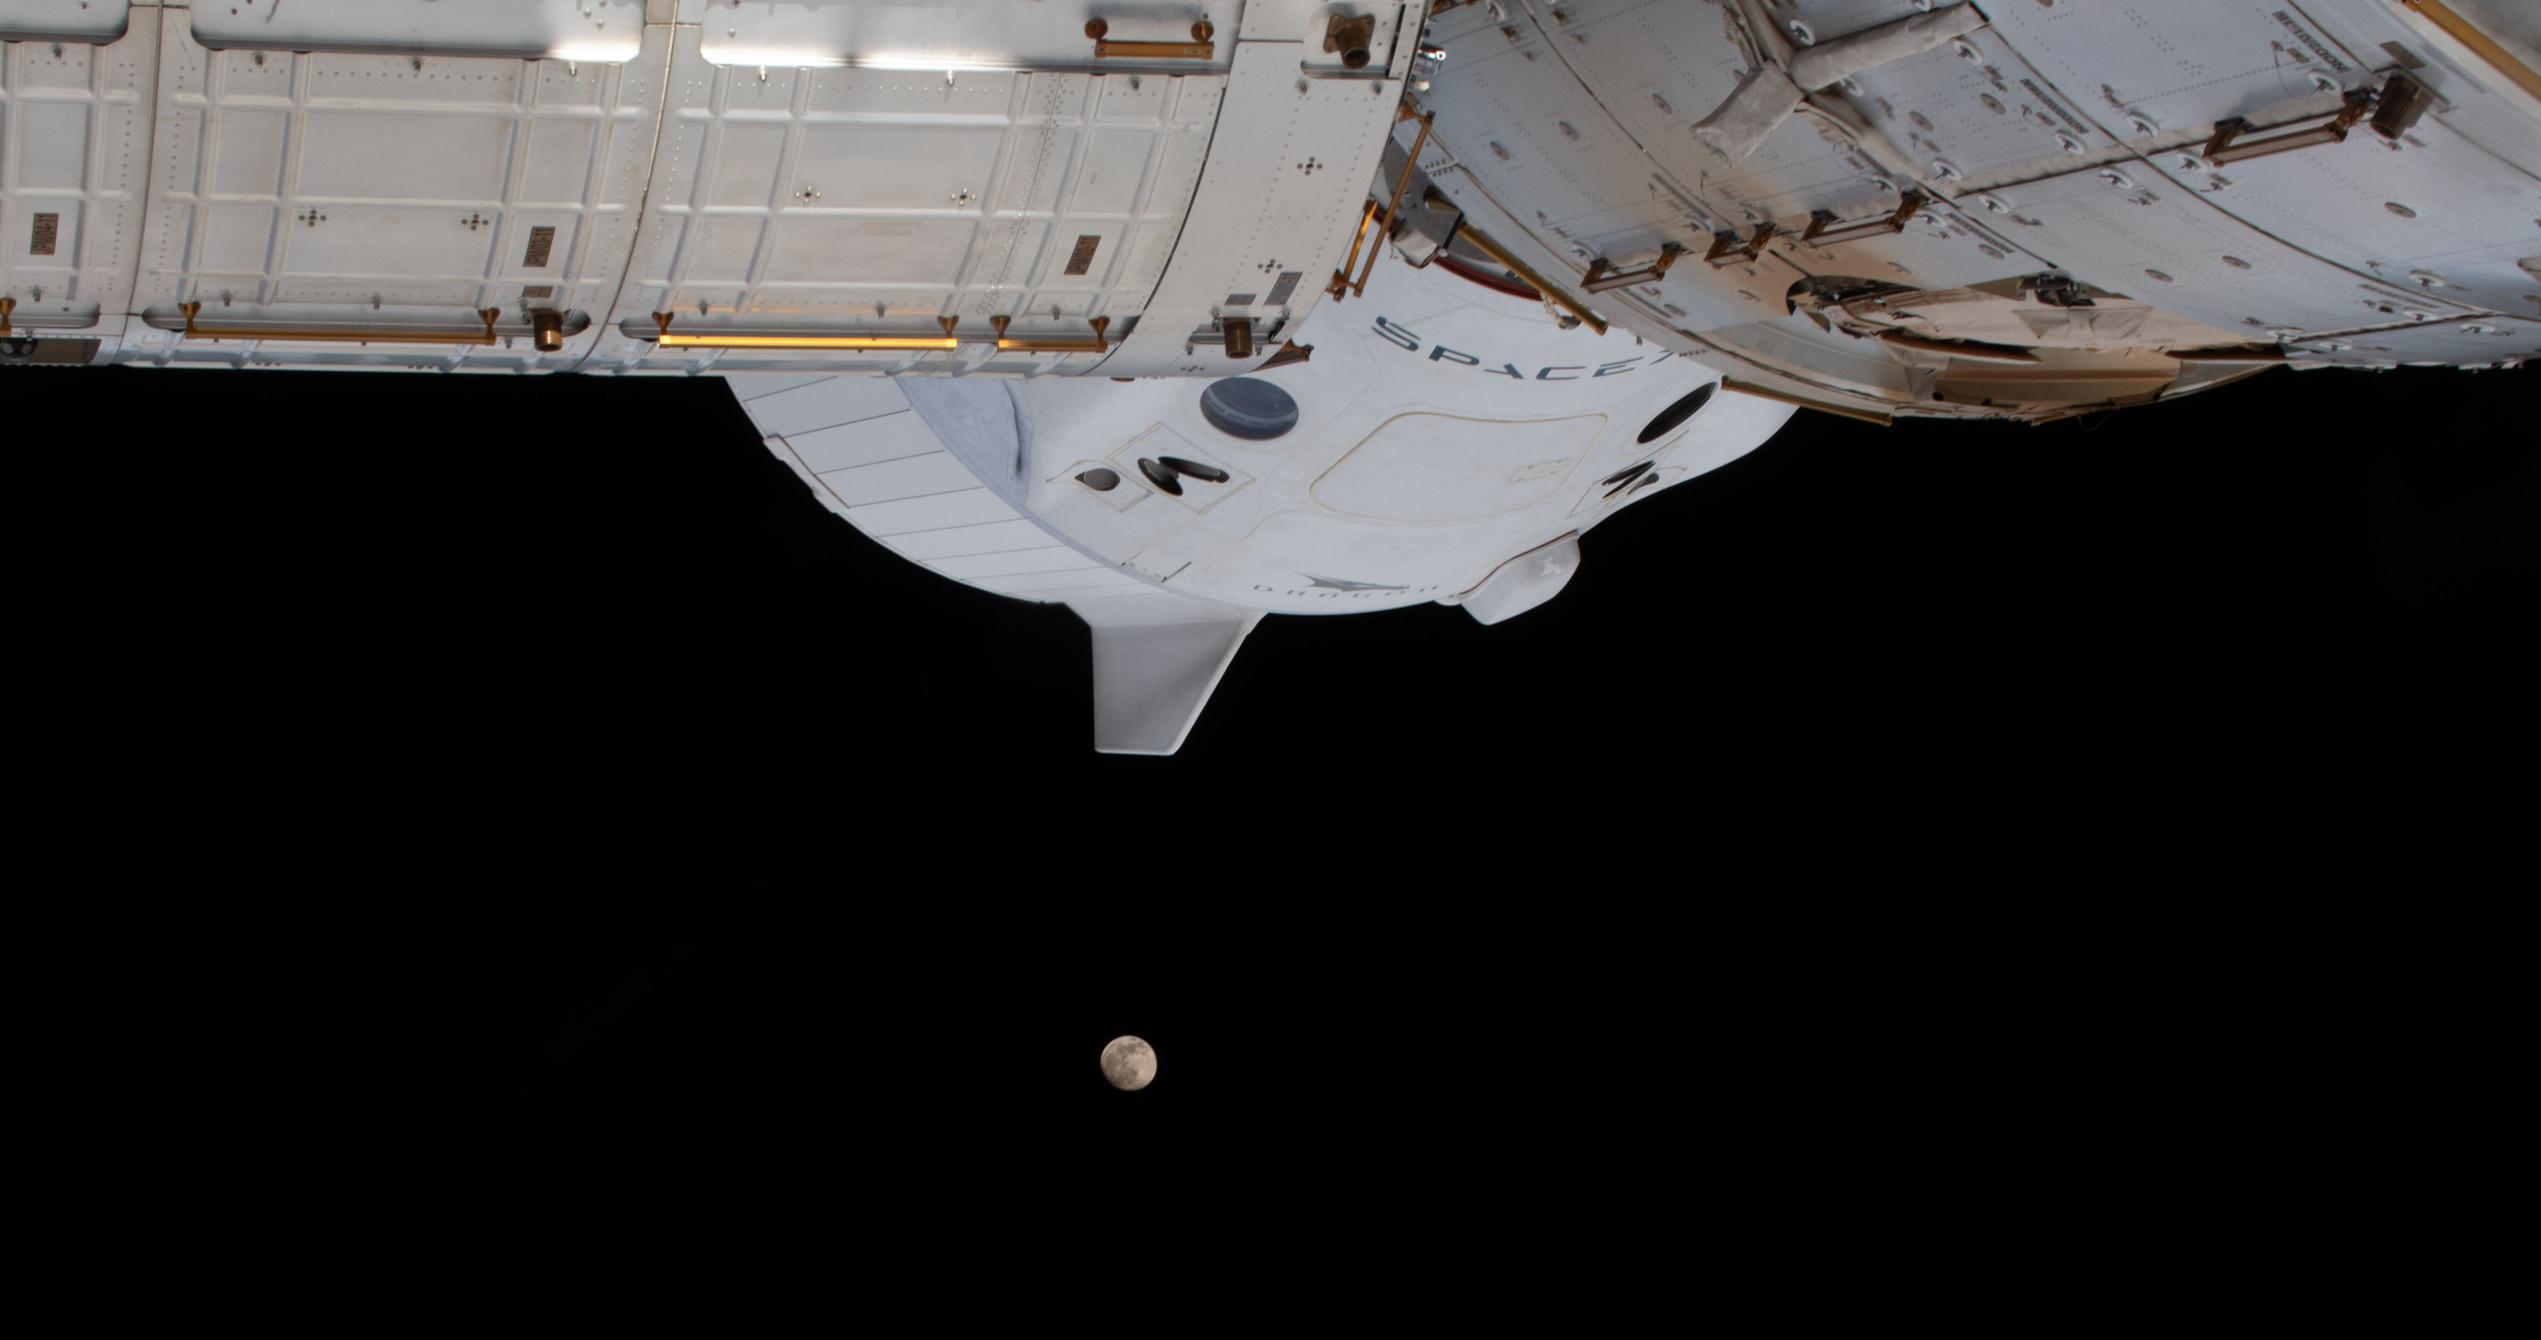 Crew Dragon C207 Crew-1 ISS 012621 (NASA) Moon eclipse 7 crop (c)